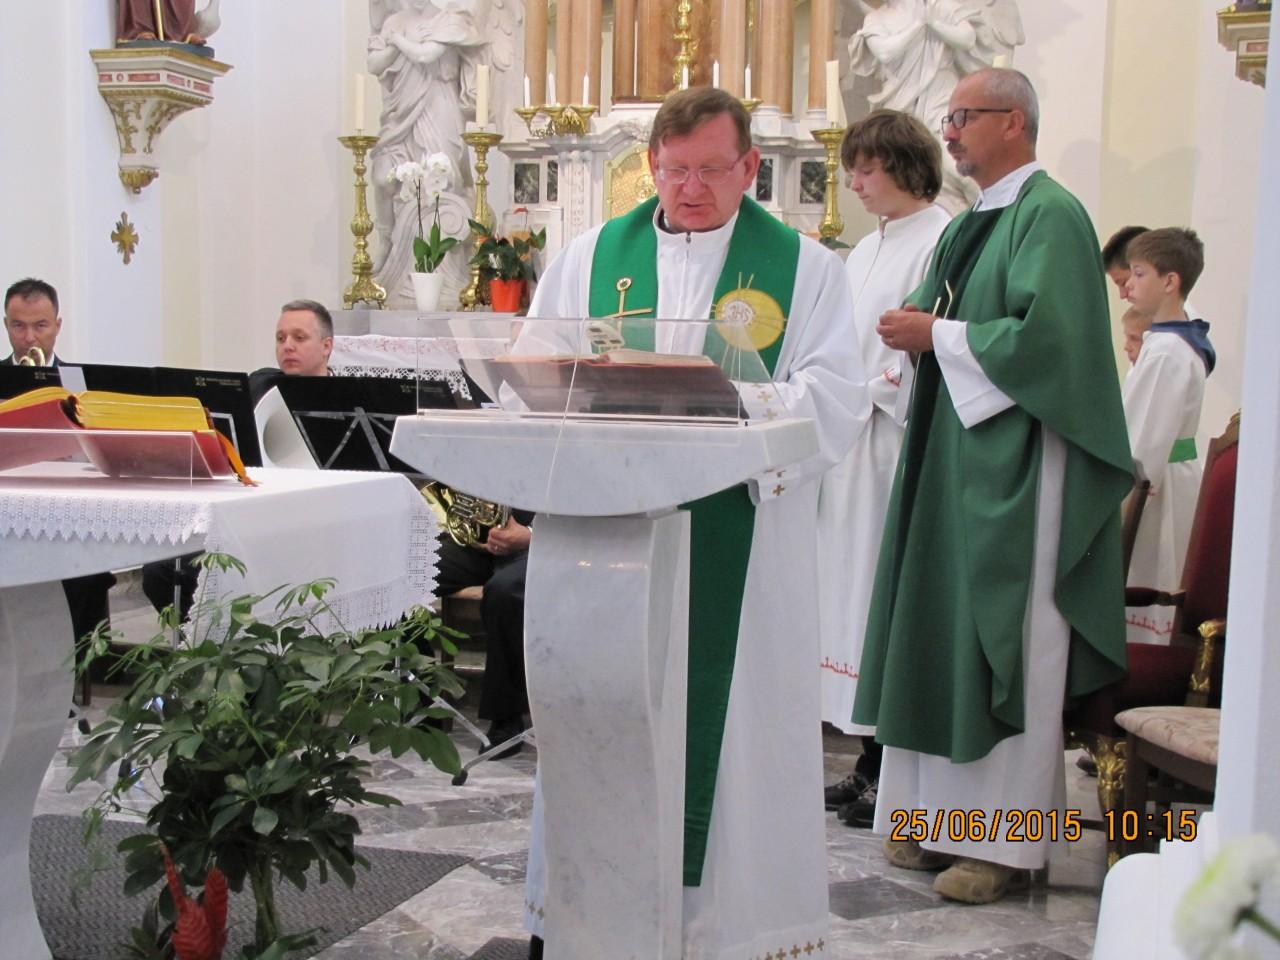 Evangelij, Janez Petrič, domači župnik